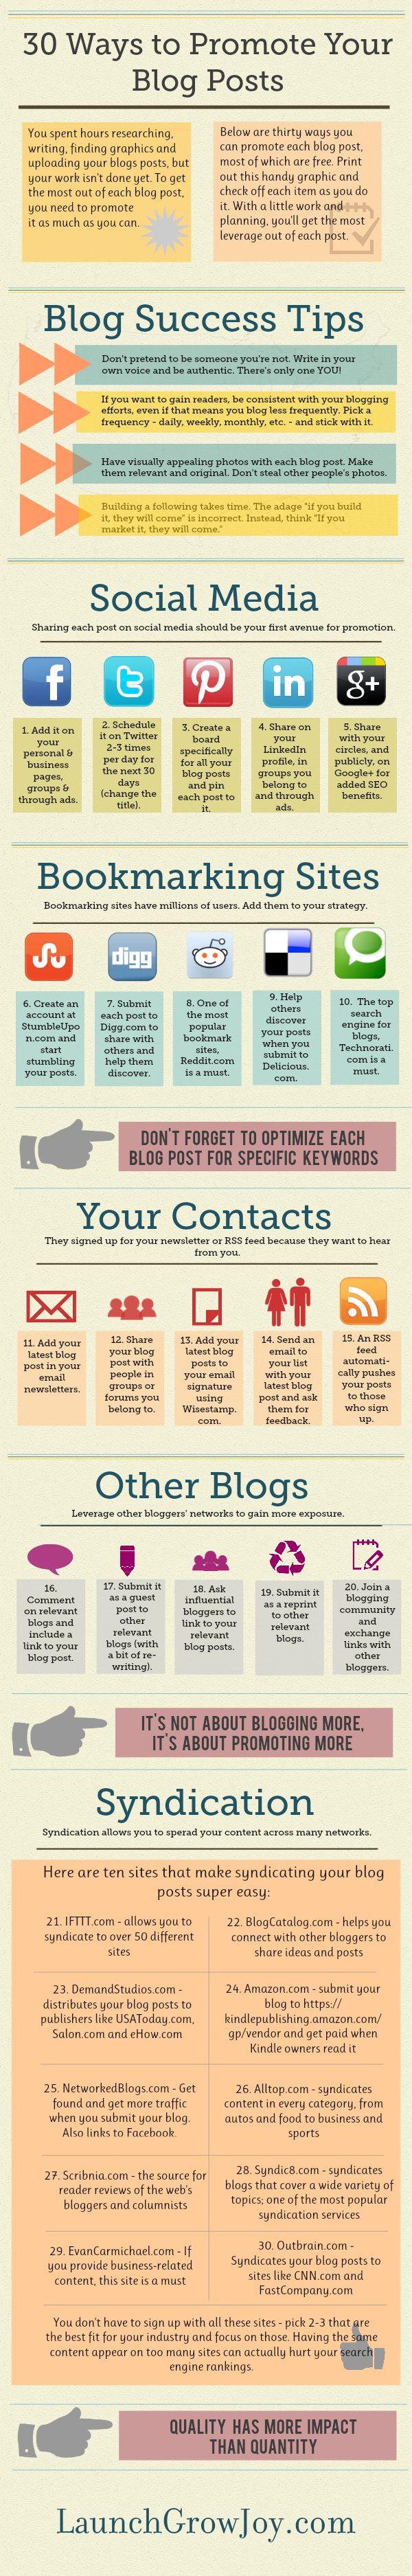 30 ways to improve blog posts